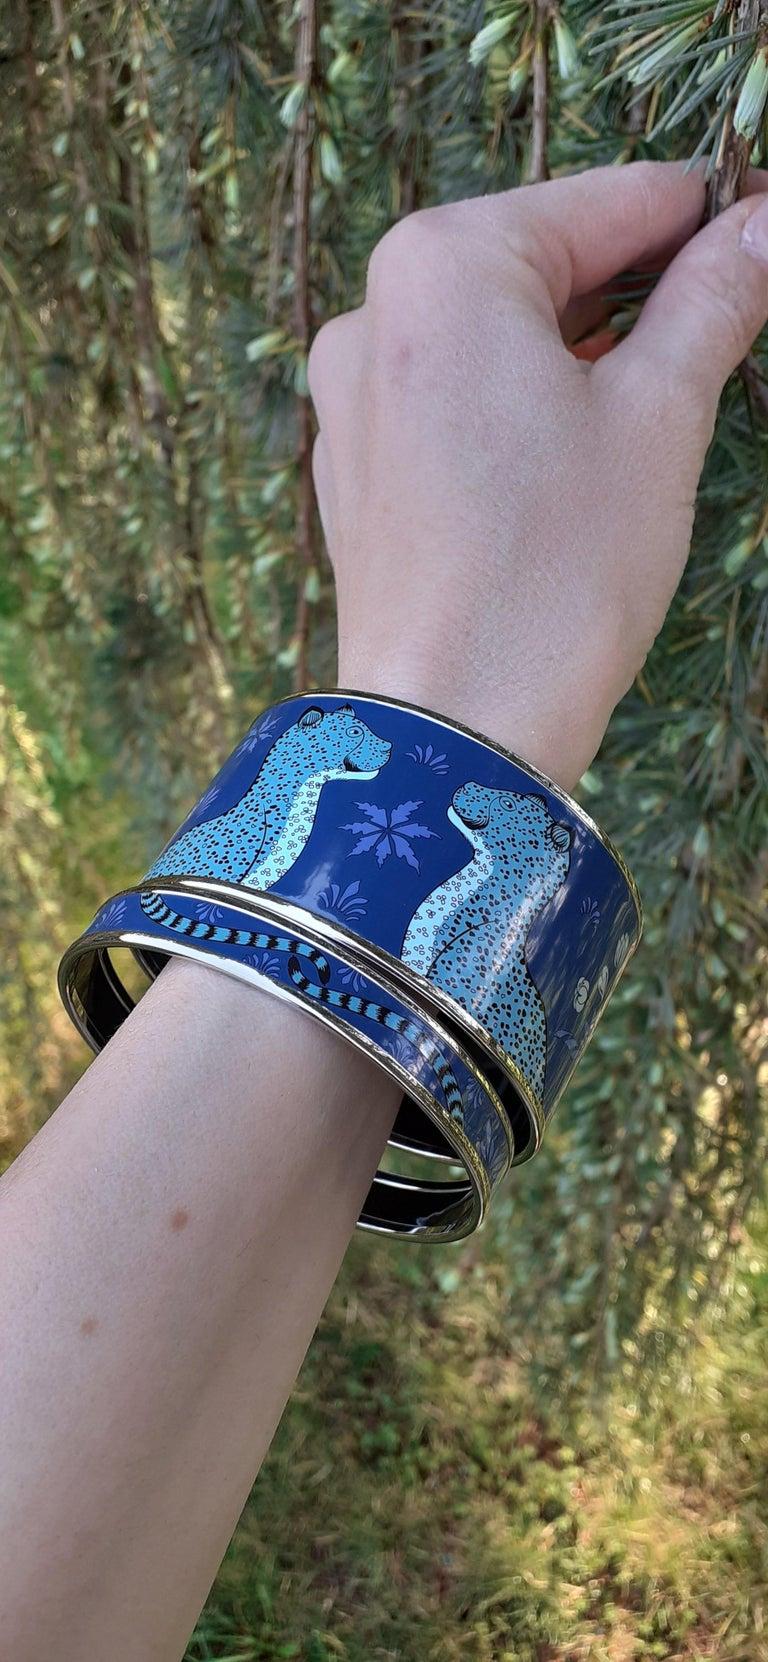 Hermès Enamel Printed Bracelet Leopards Blue Extra Wide Palladium Hdw Size GM 70 For Sale 8